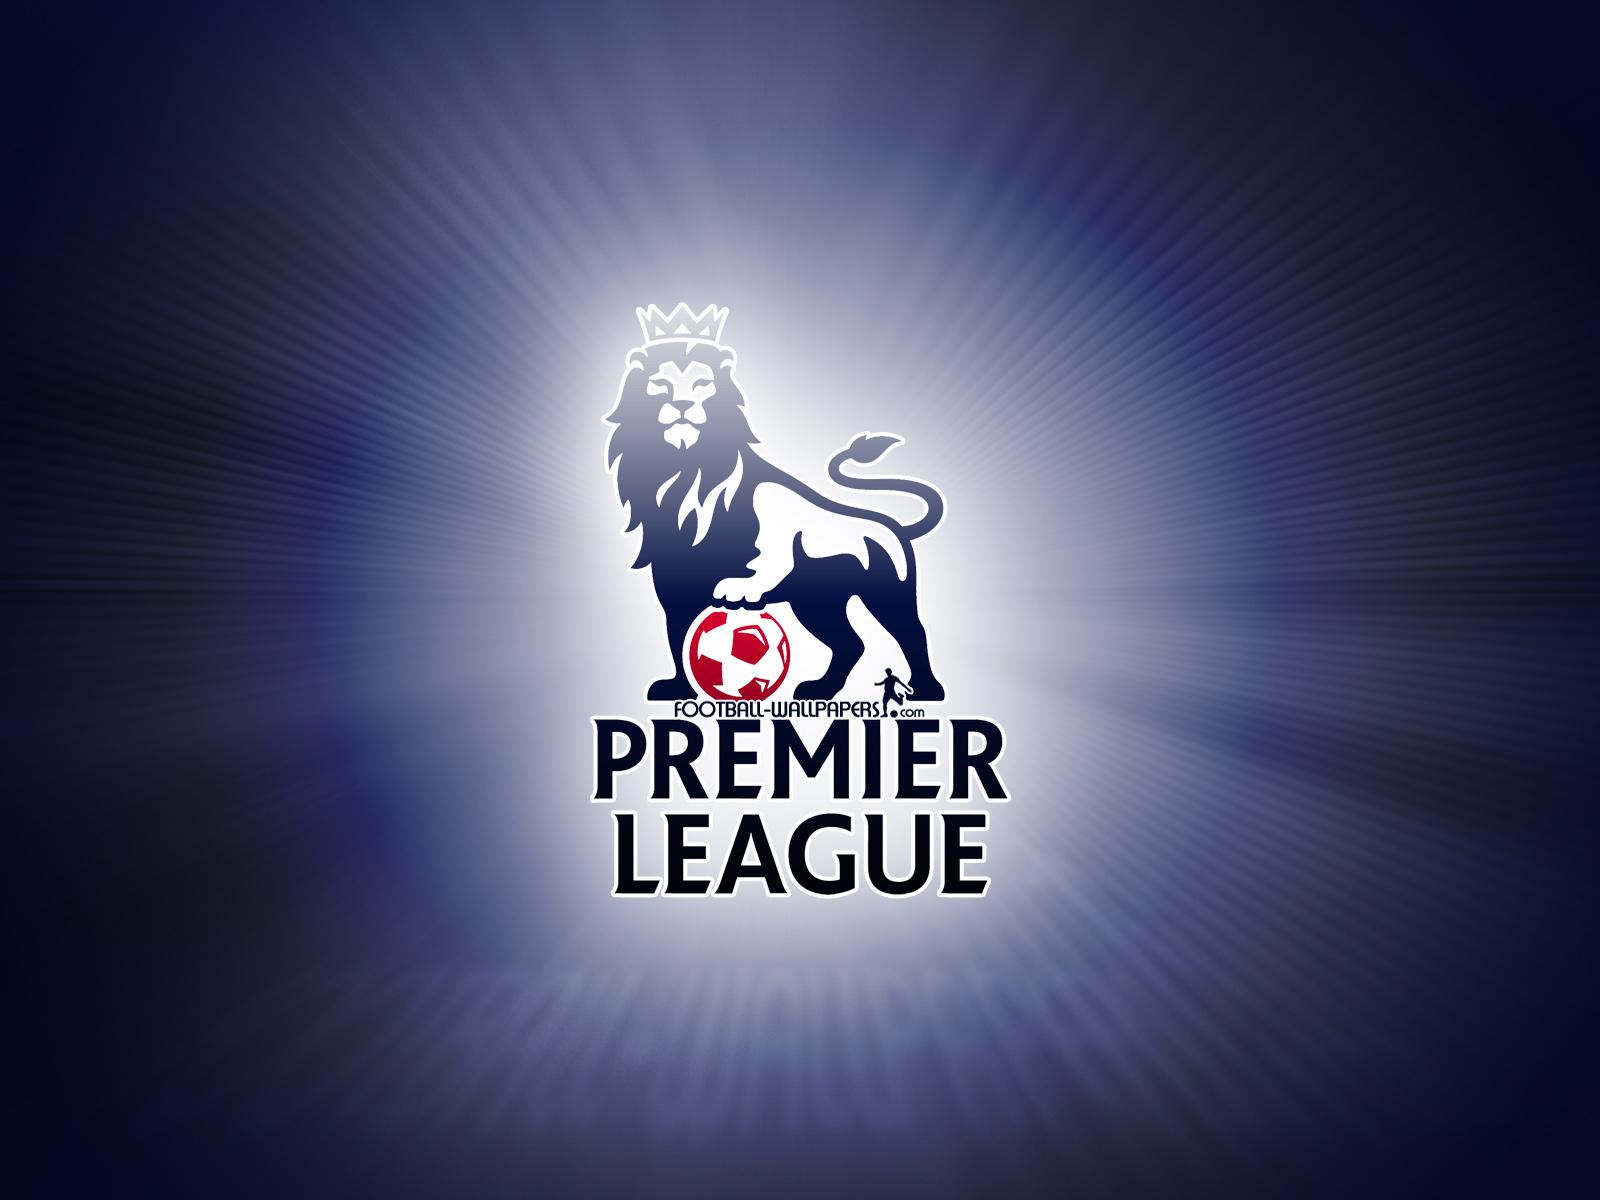 Premier League Calendario.Premier League Manchester Chelsea Gia Alla Seconda Ecco